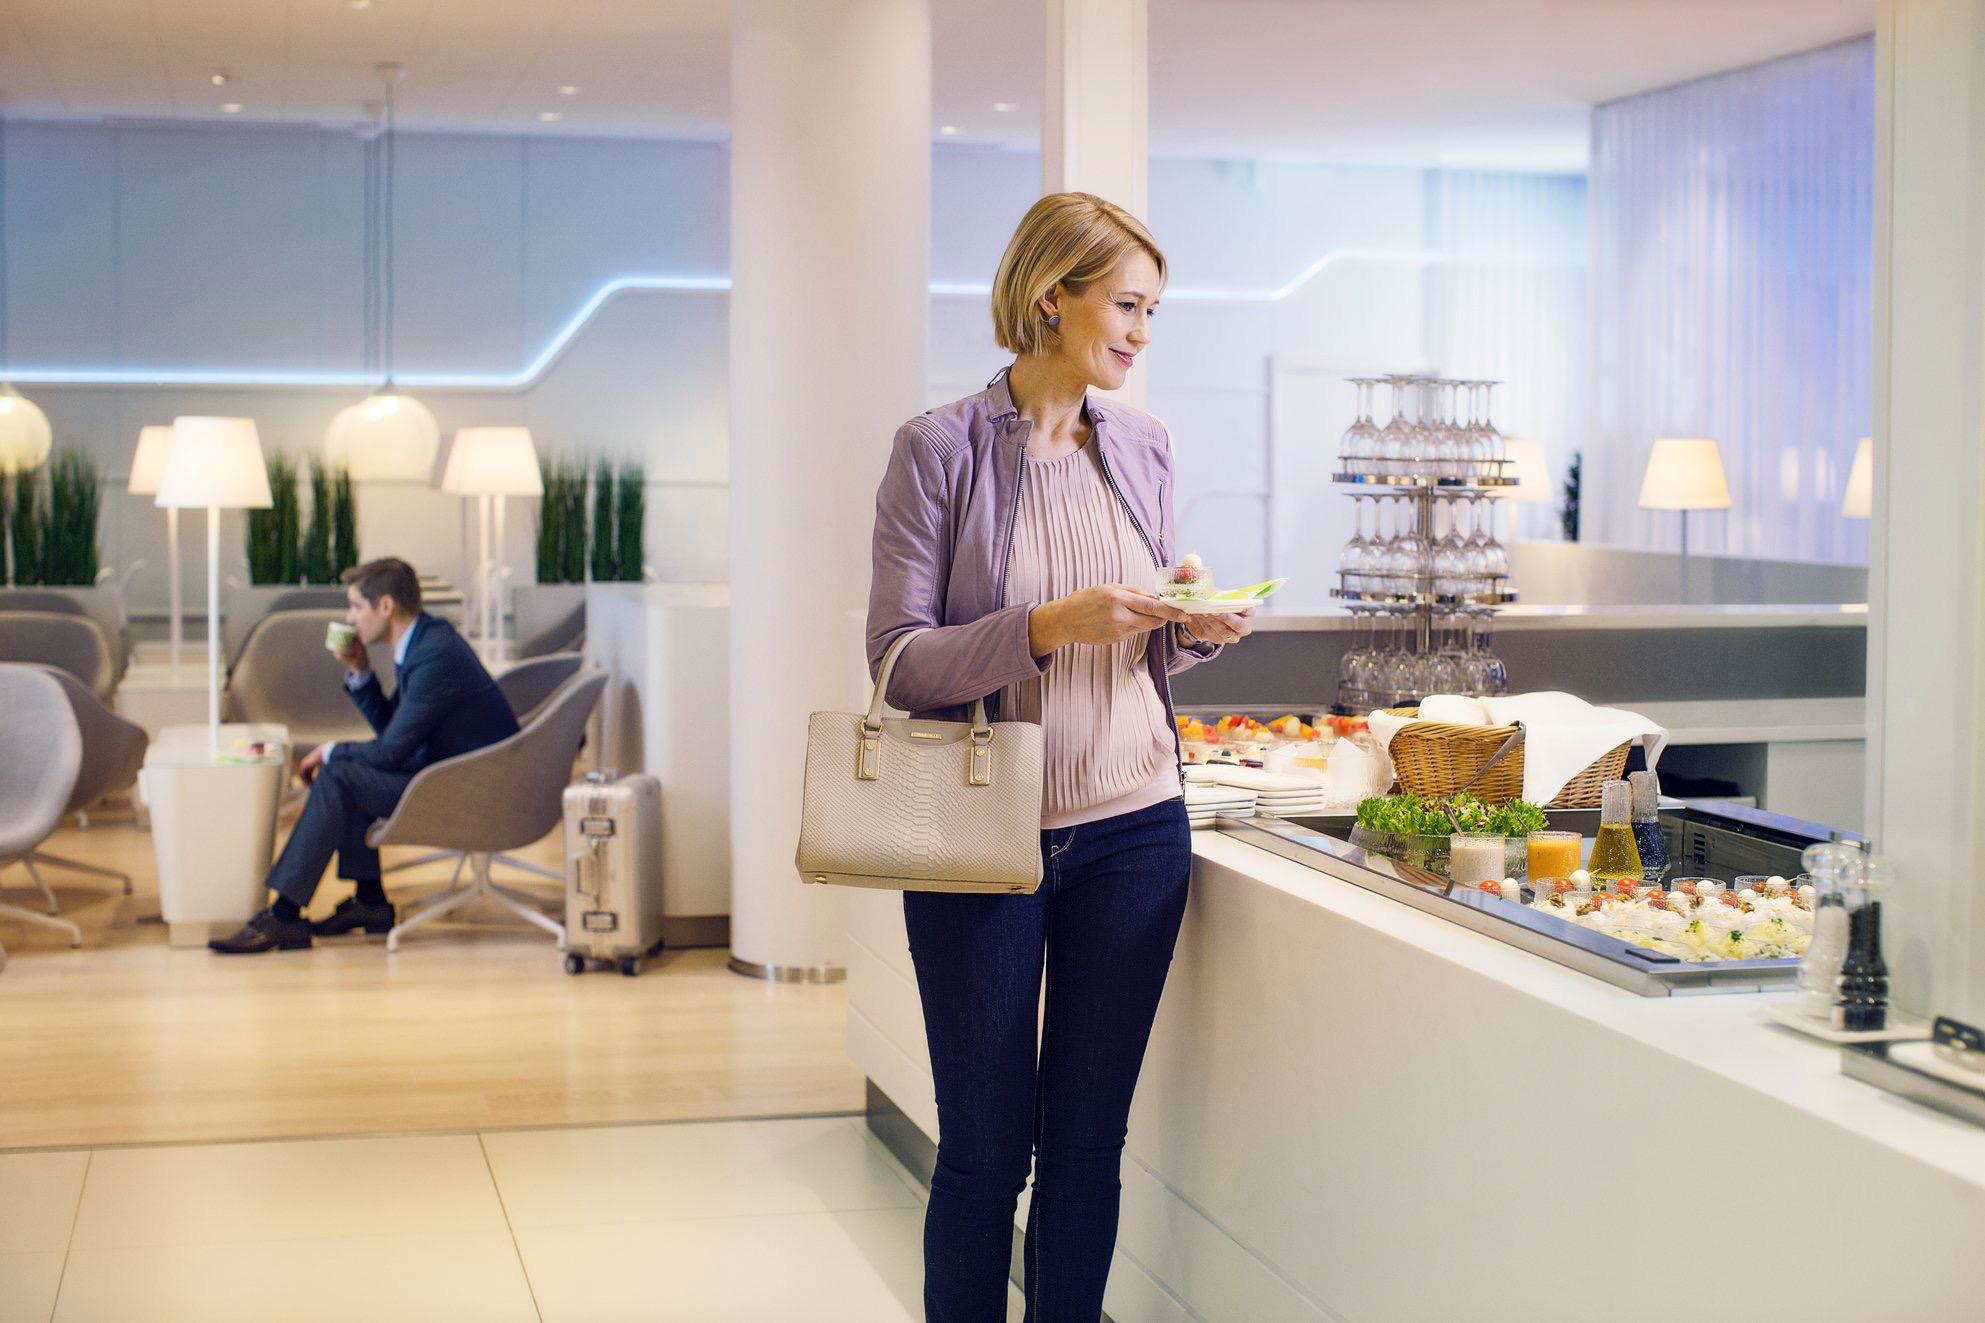 Finnair Introduces Fazer café services at Helsinki Lounges Source: Finnair